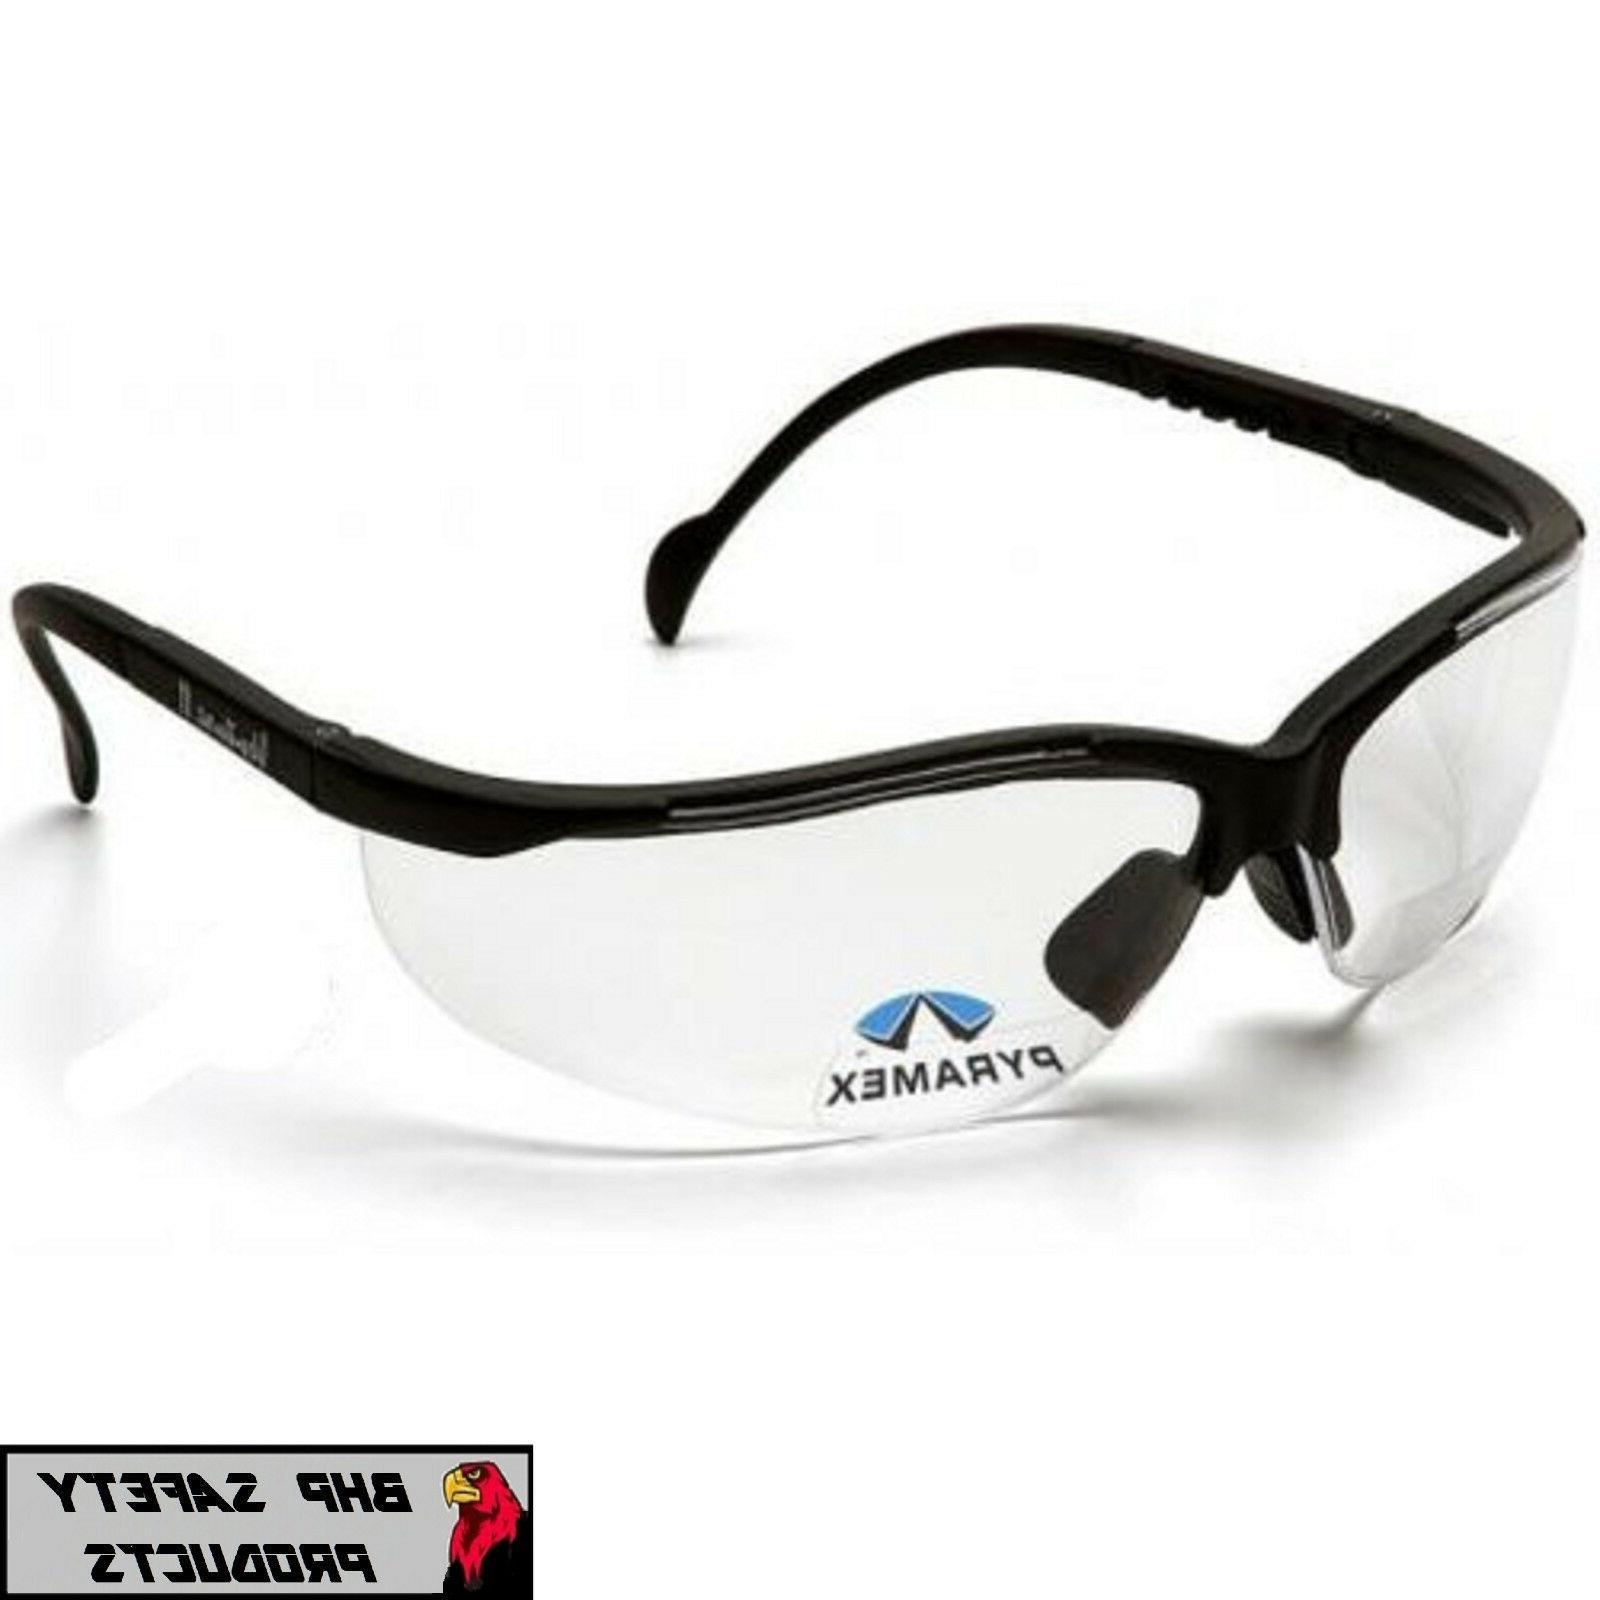 PYRAMEX VENTURE II V2 READER SAFETY GLASSES CLEAR BIFOCAL +2